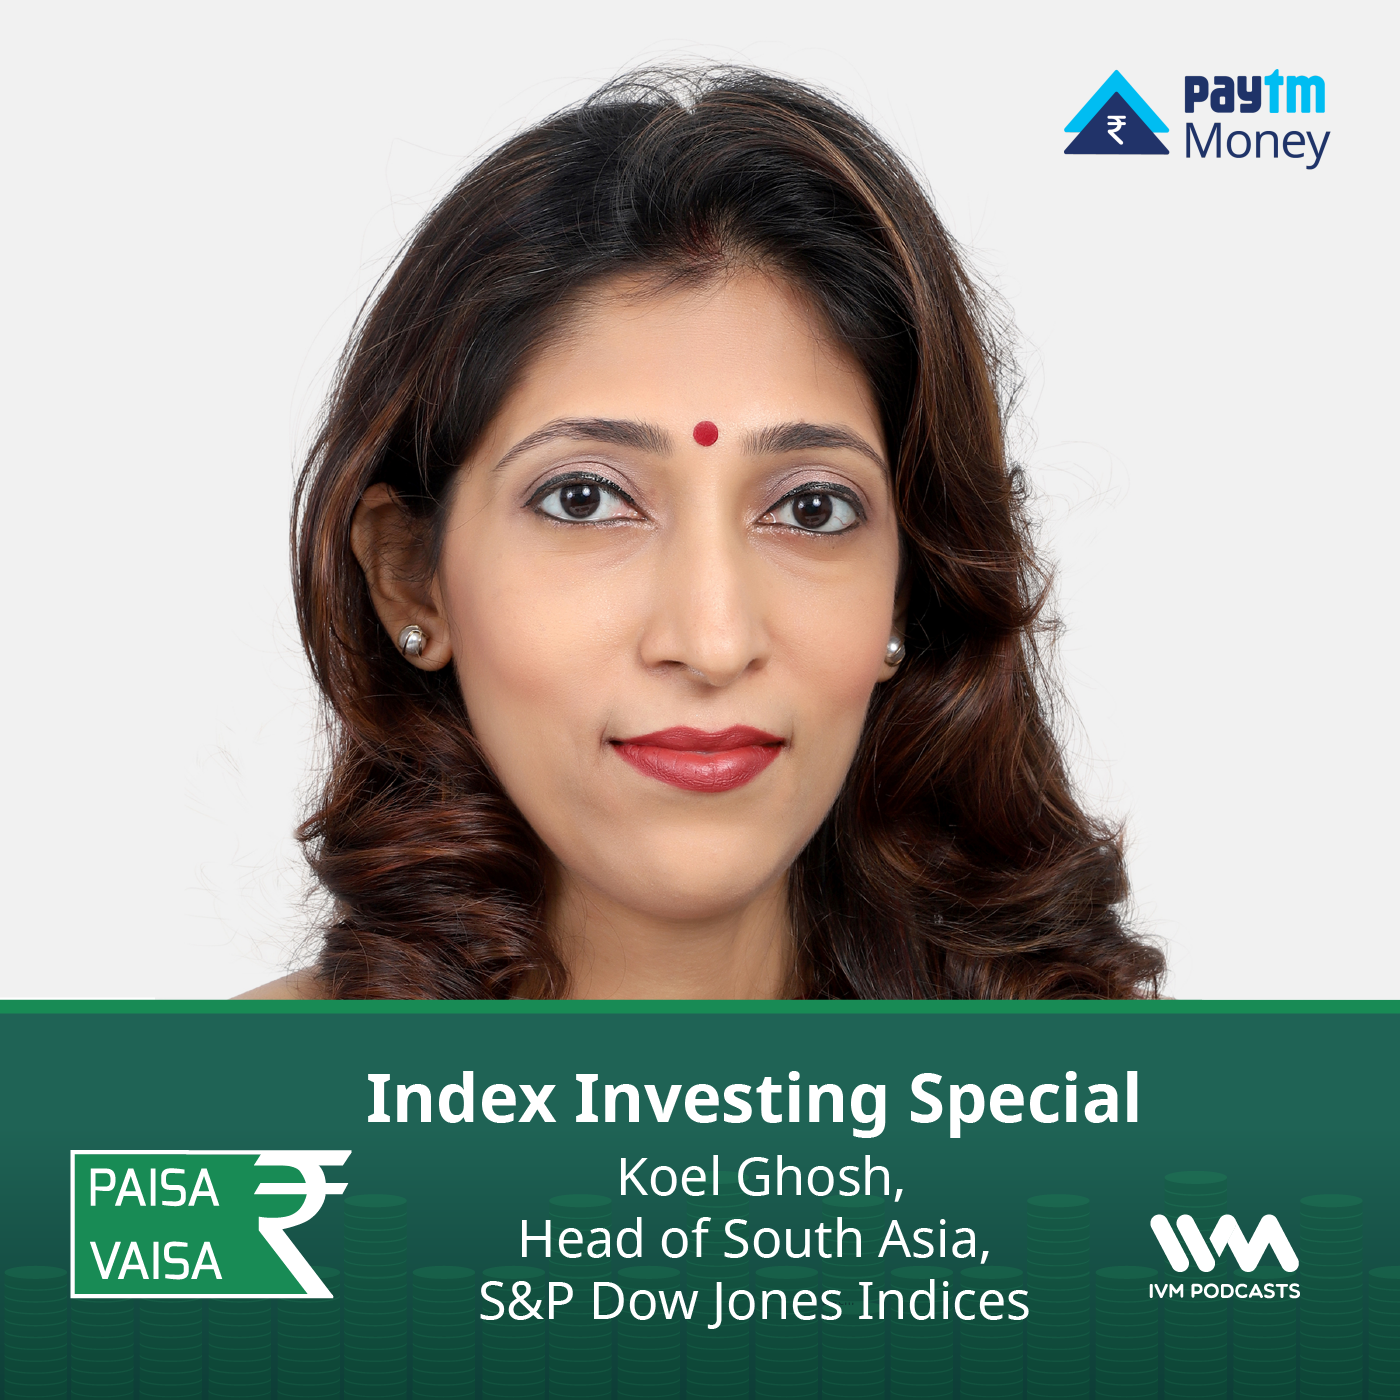 Ep. 240: Index Investing Special